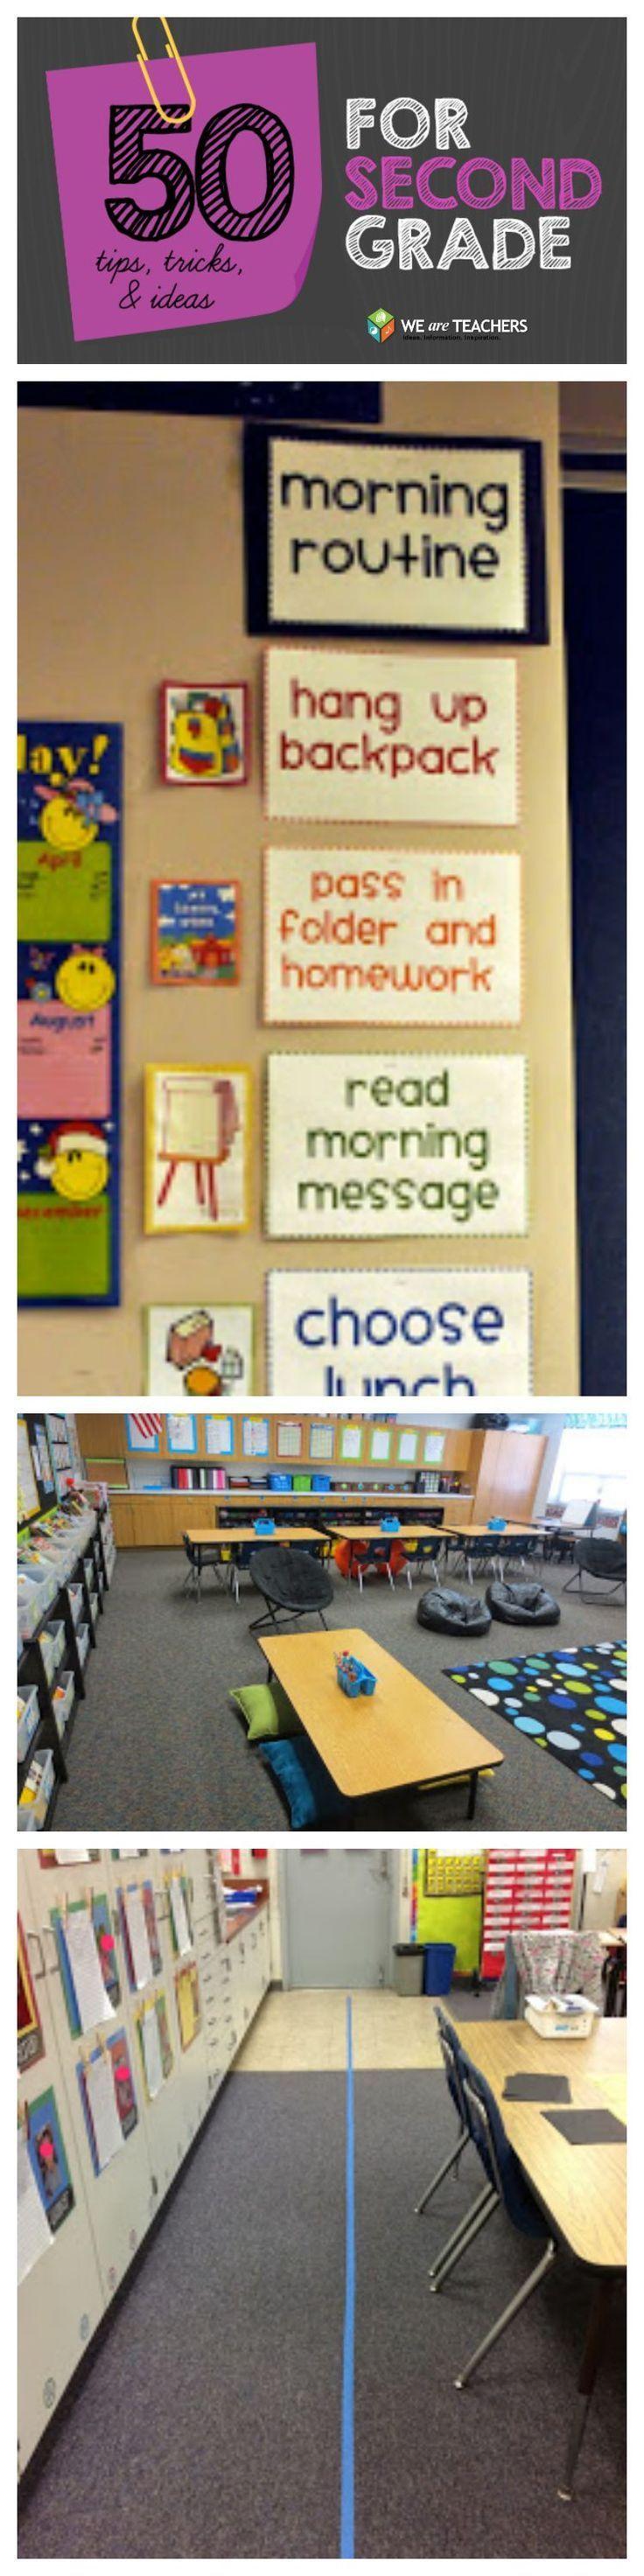 Classroom procedures classroom organization classroom management - So Many Amazing Tips And Tricks For 2nd Grade Classroom Teachers